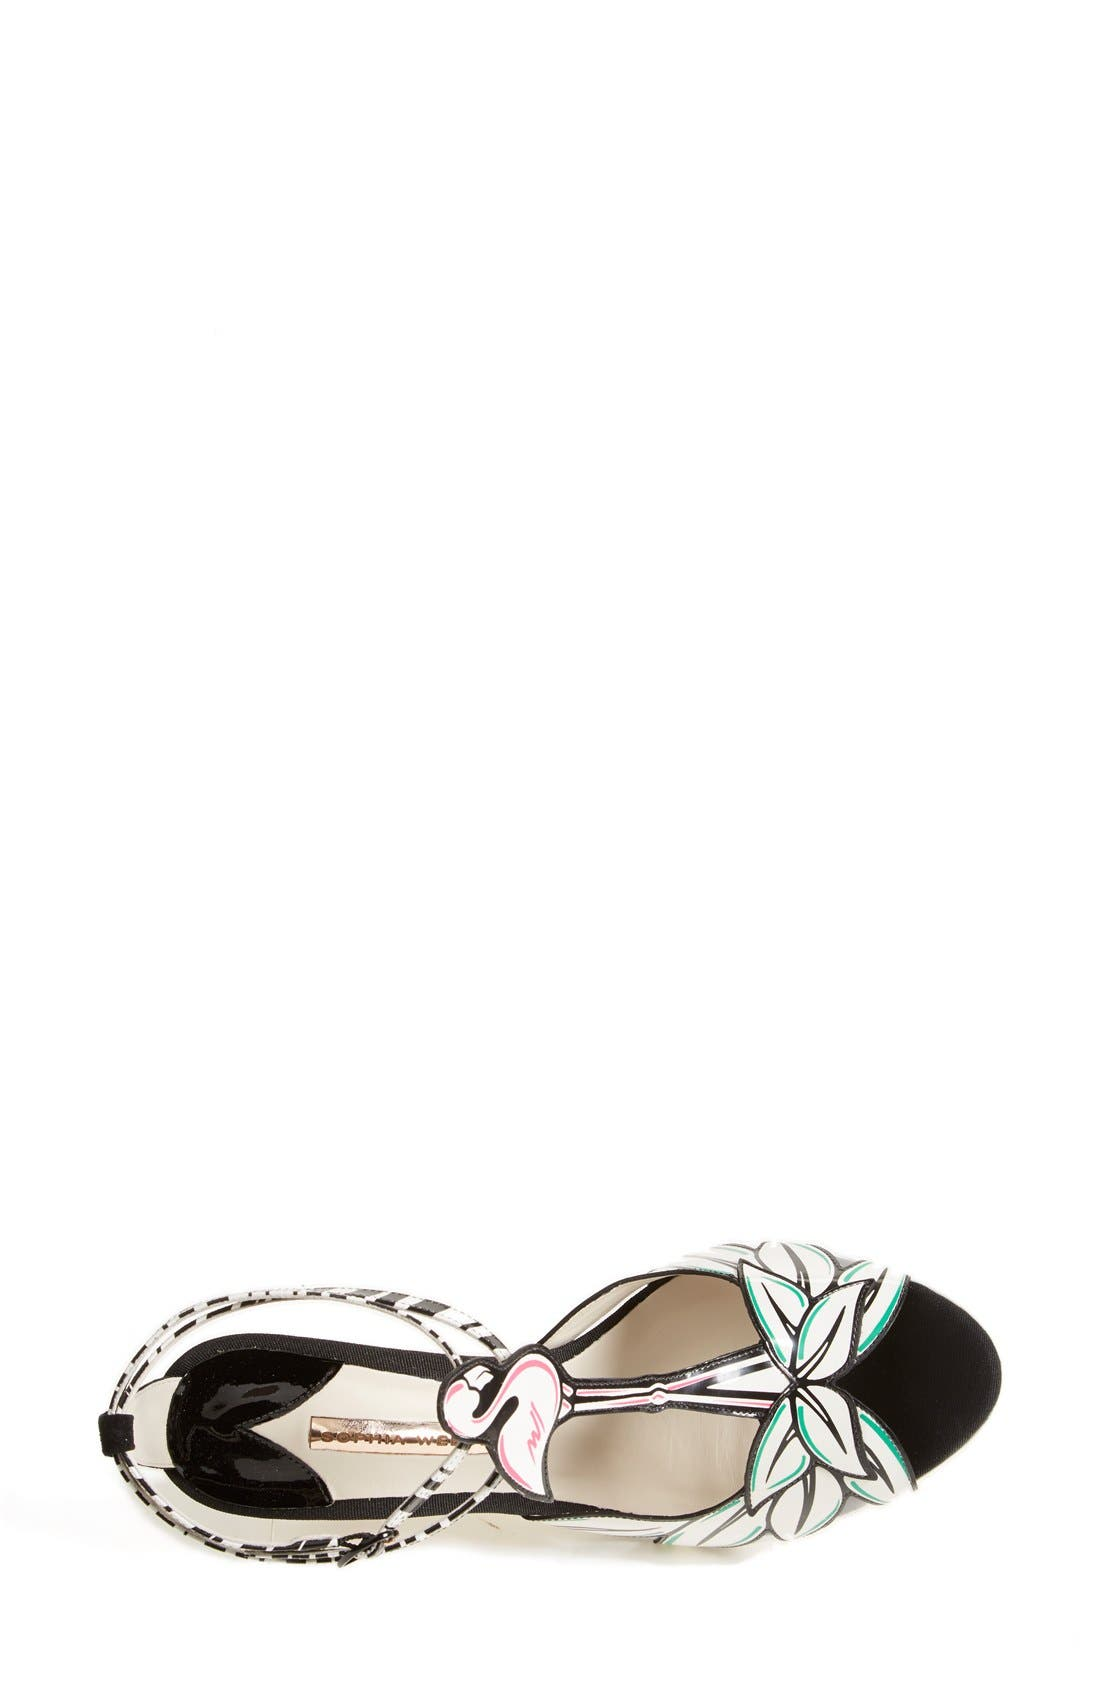 Alternate Image 3  - Sophia Webster 'Flamingo' T-Strap Leather Sandal (Women)